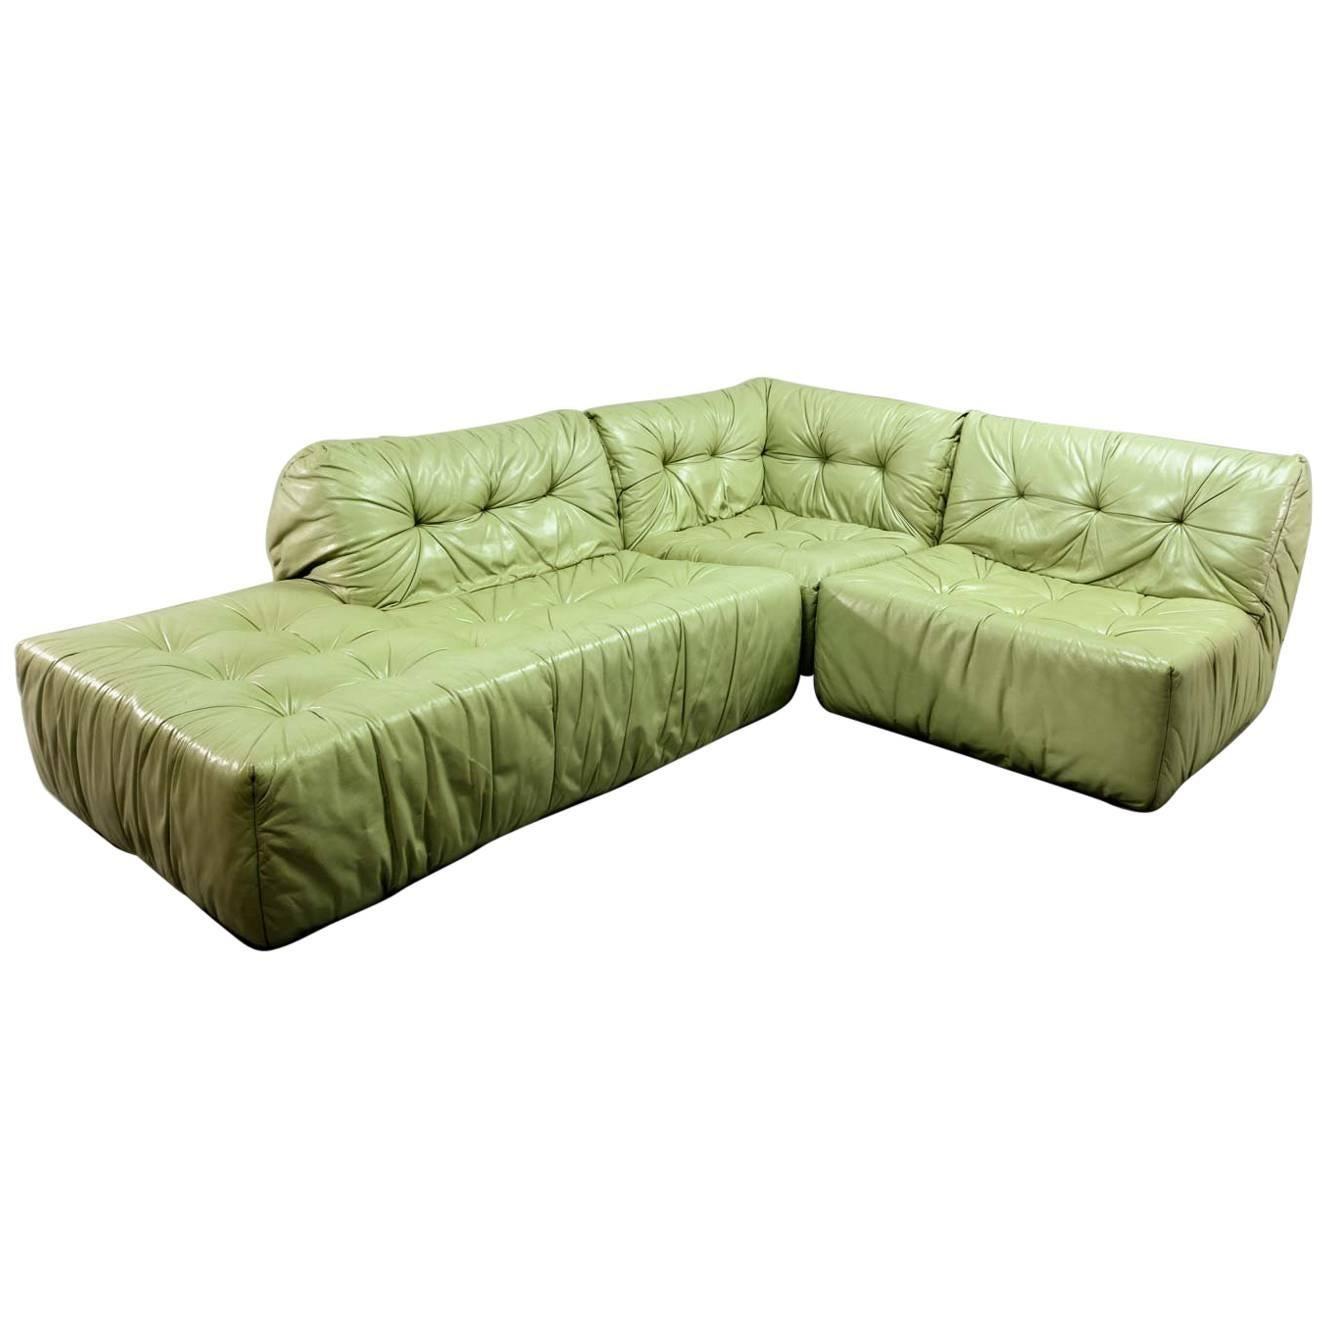 Roche Bobois Long Island Sofa Images 100 Roche Bobois Calisto  # Nattier Rochebobois